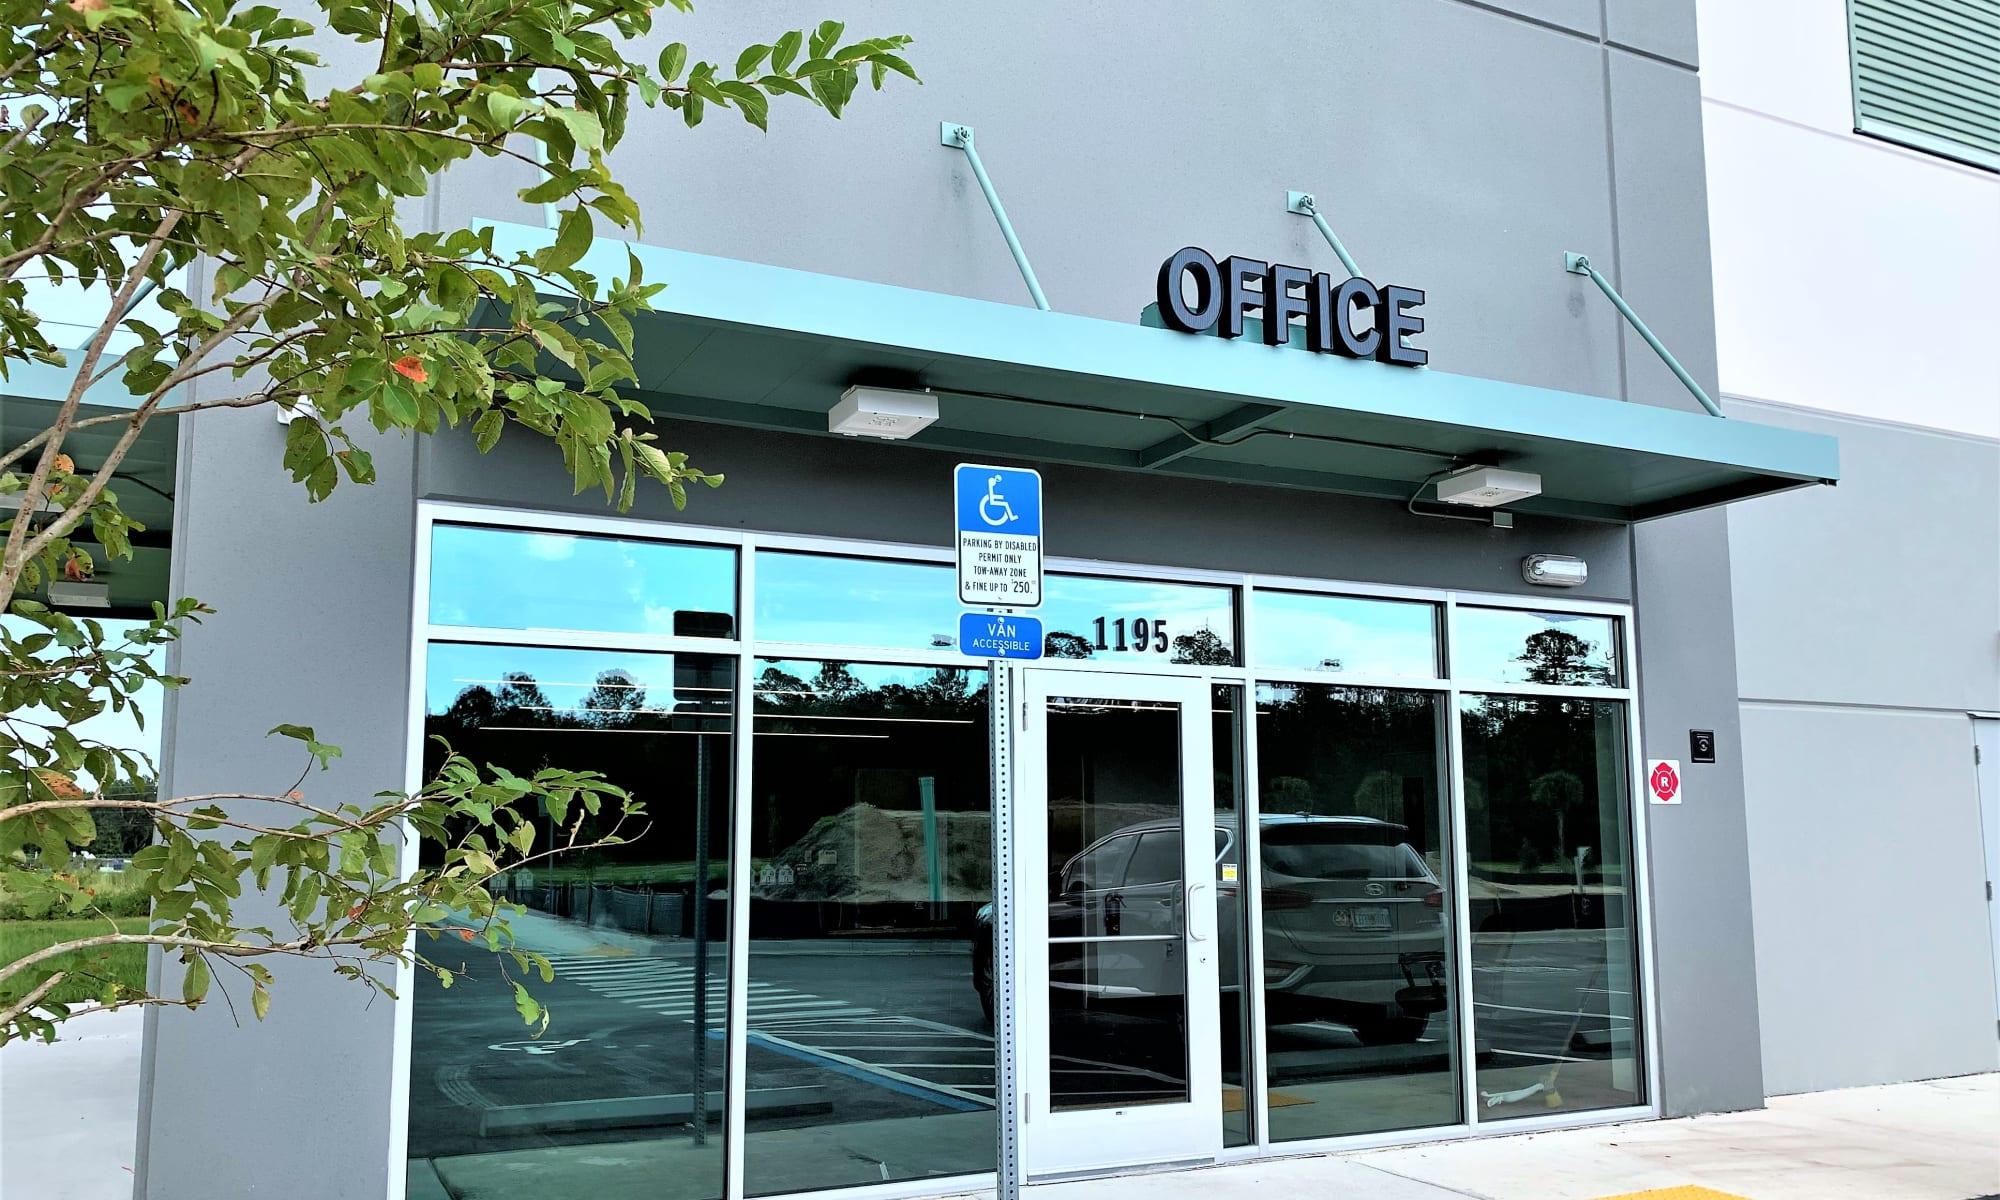 Entrance to My Neighborhood Storage Center self storage in Jacksonville, Florida